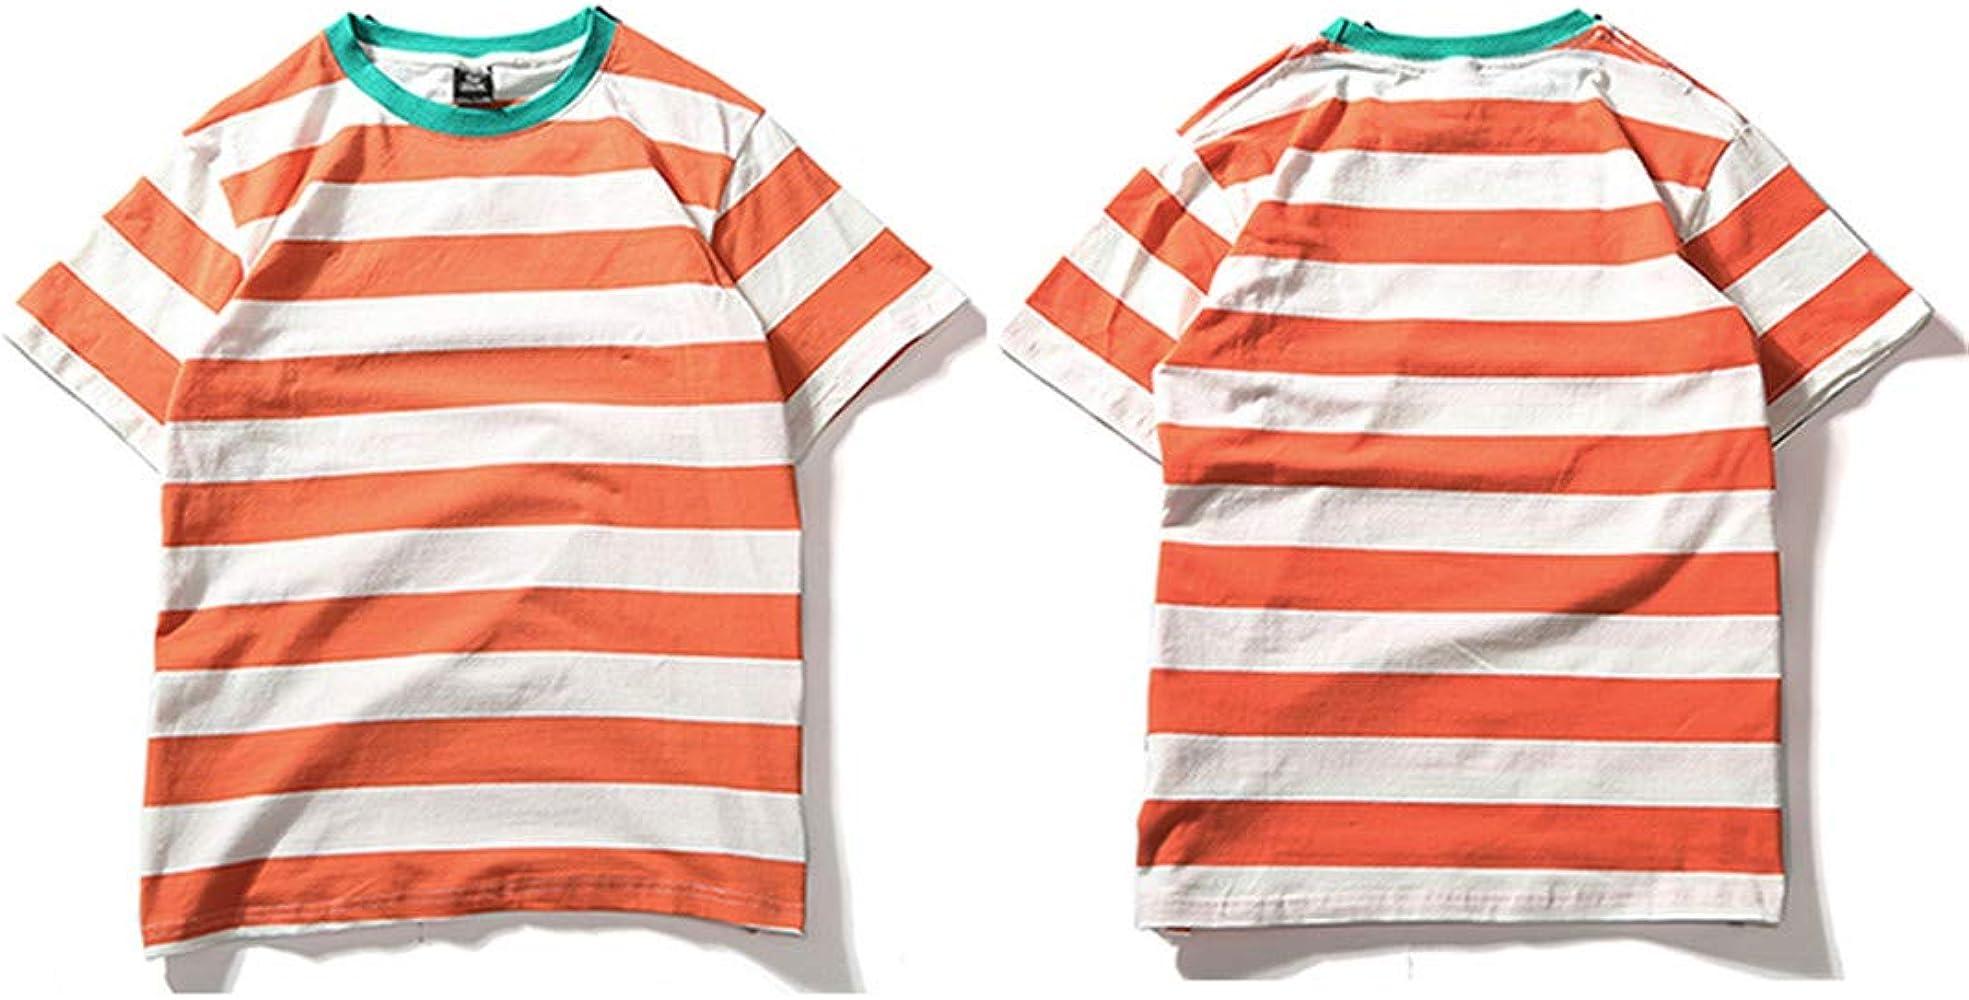 Camisa Amarilla Algodón Vintage Hip Hop Harajuku Tops Camiseta ...